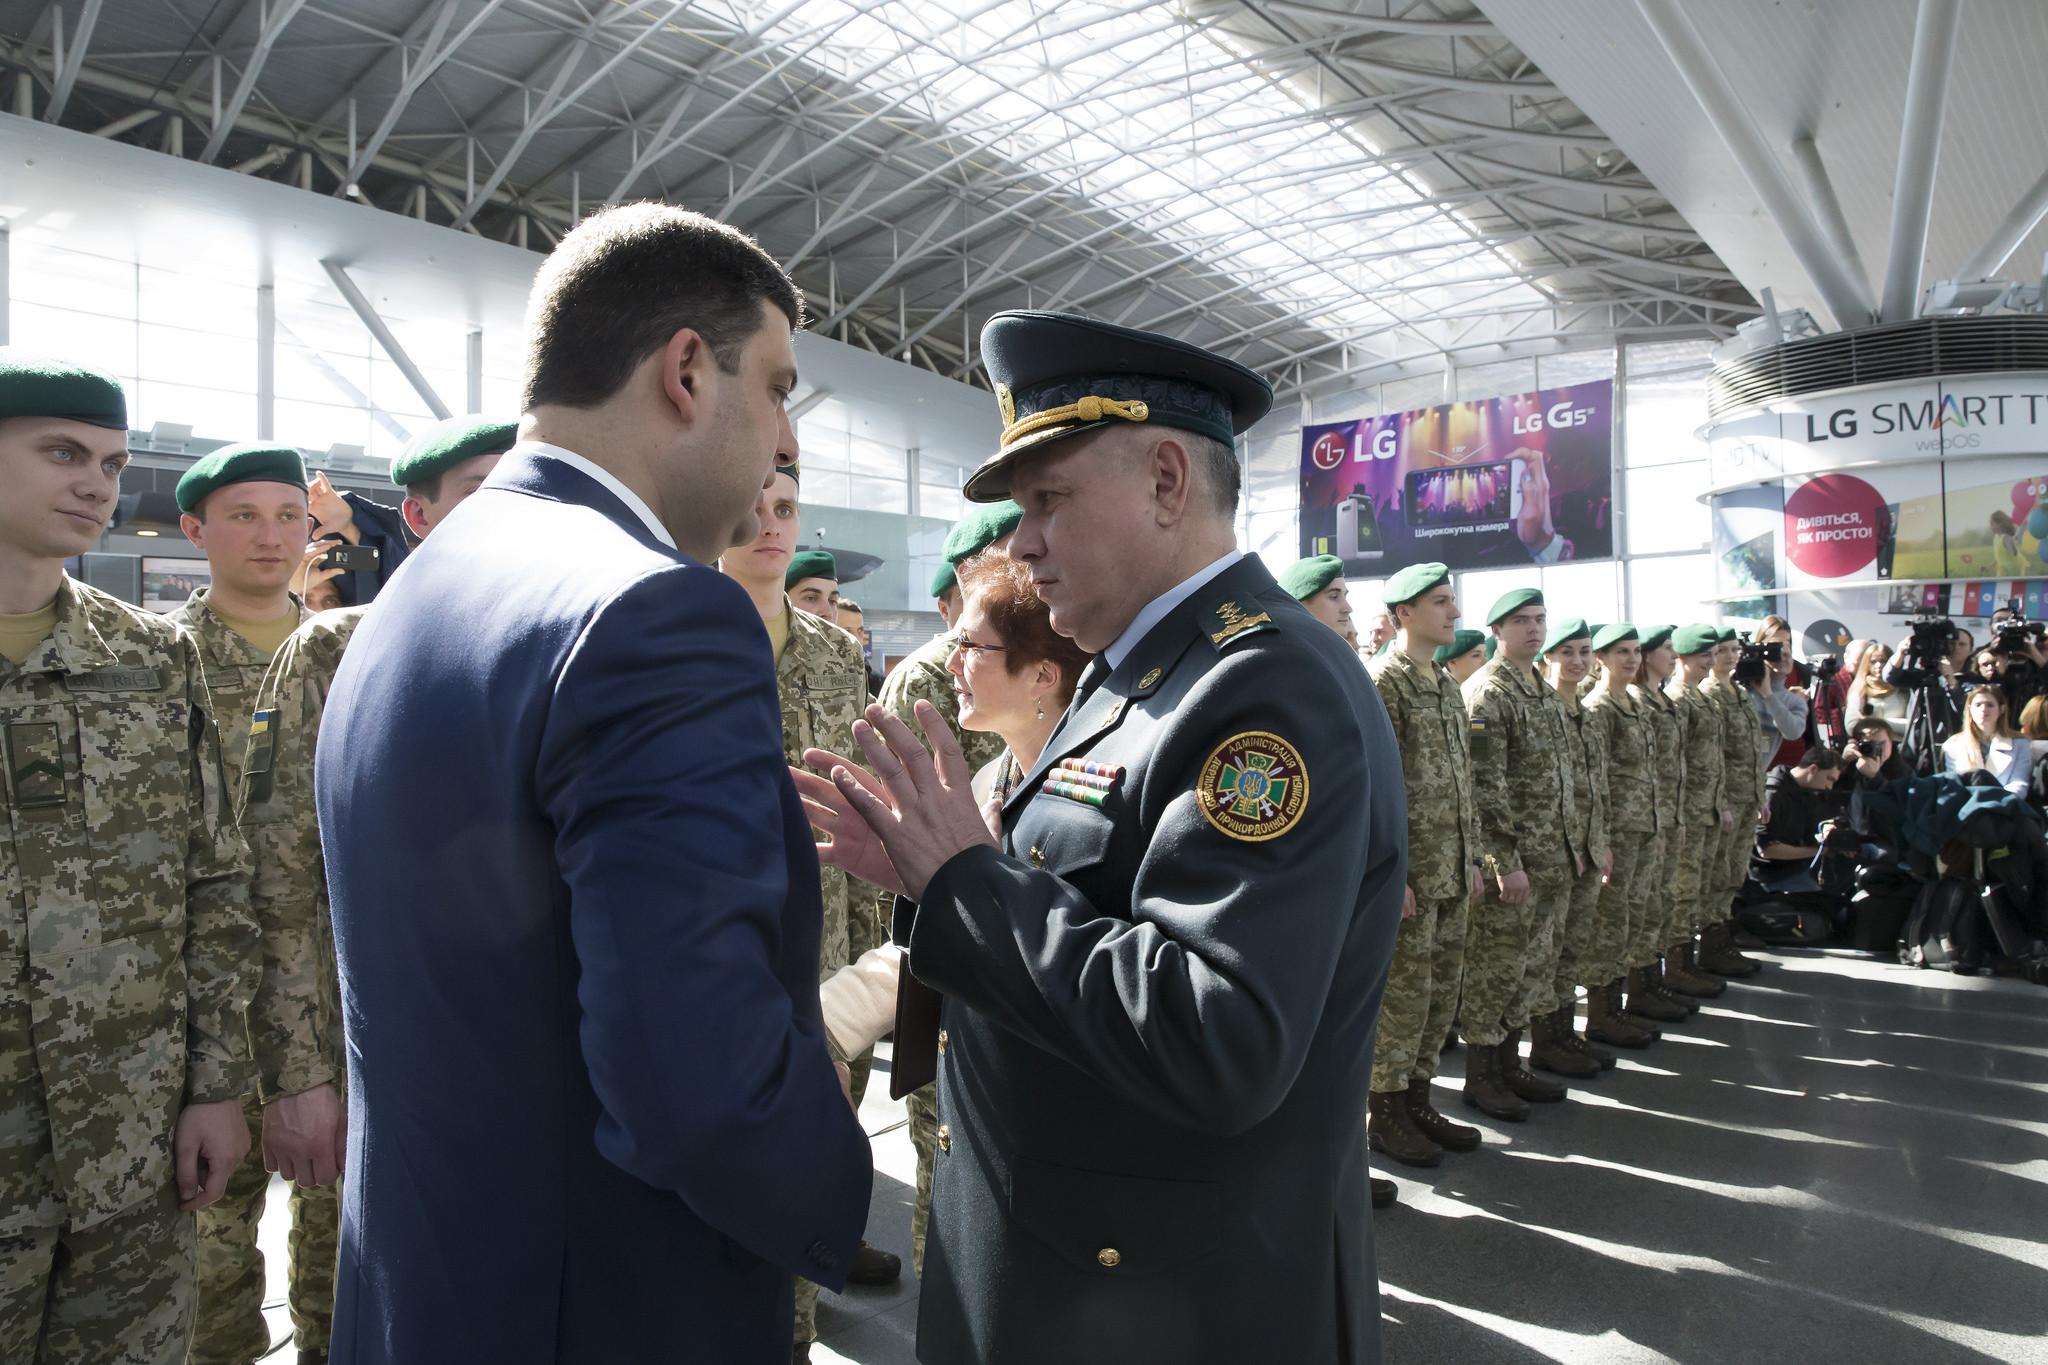 Фото: © Flickr/U.S. Embassy Kyiv Ukraine